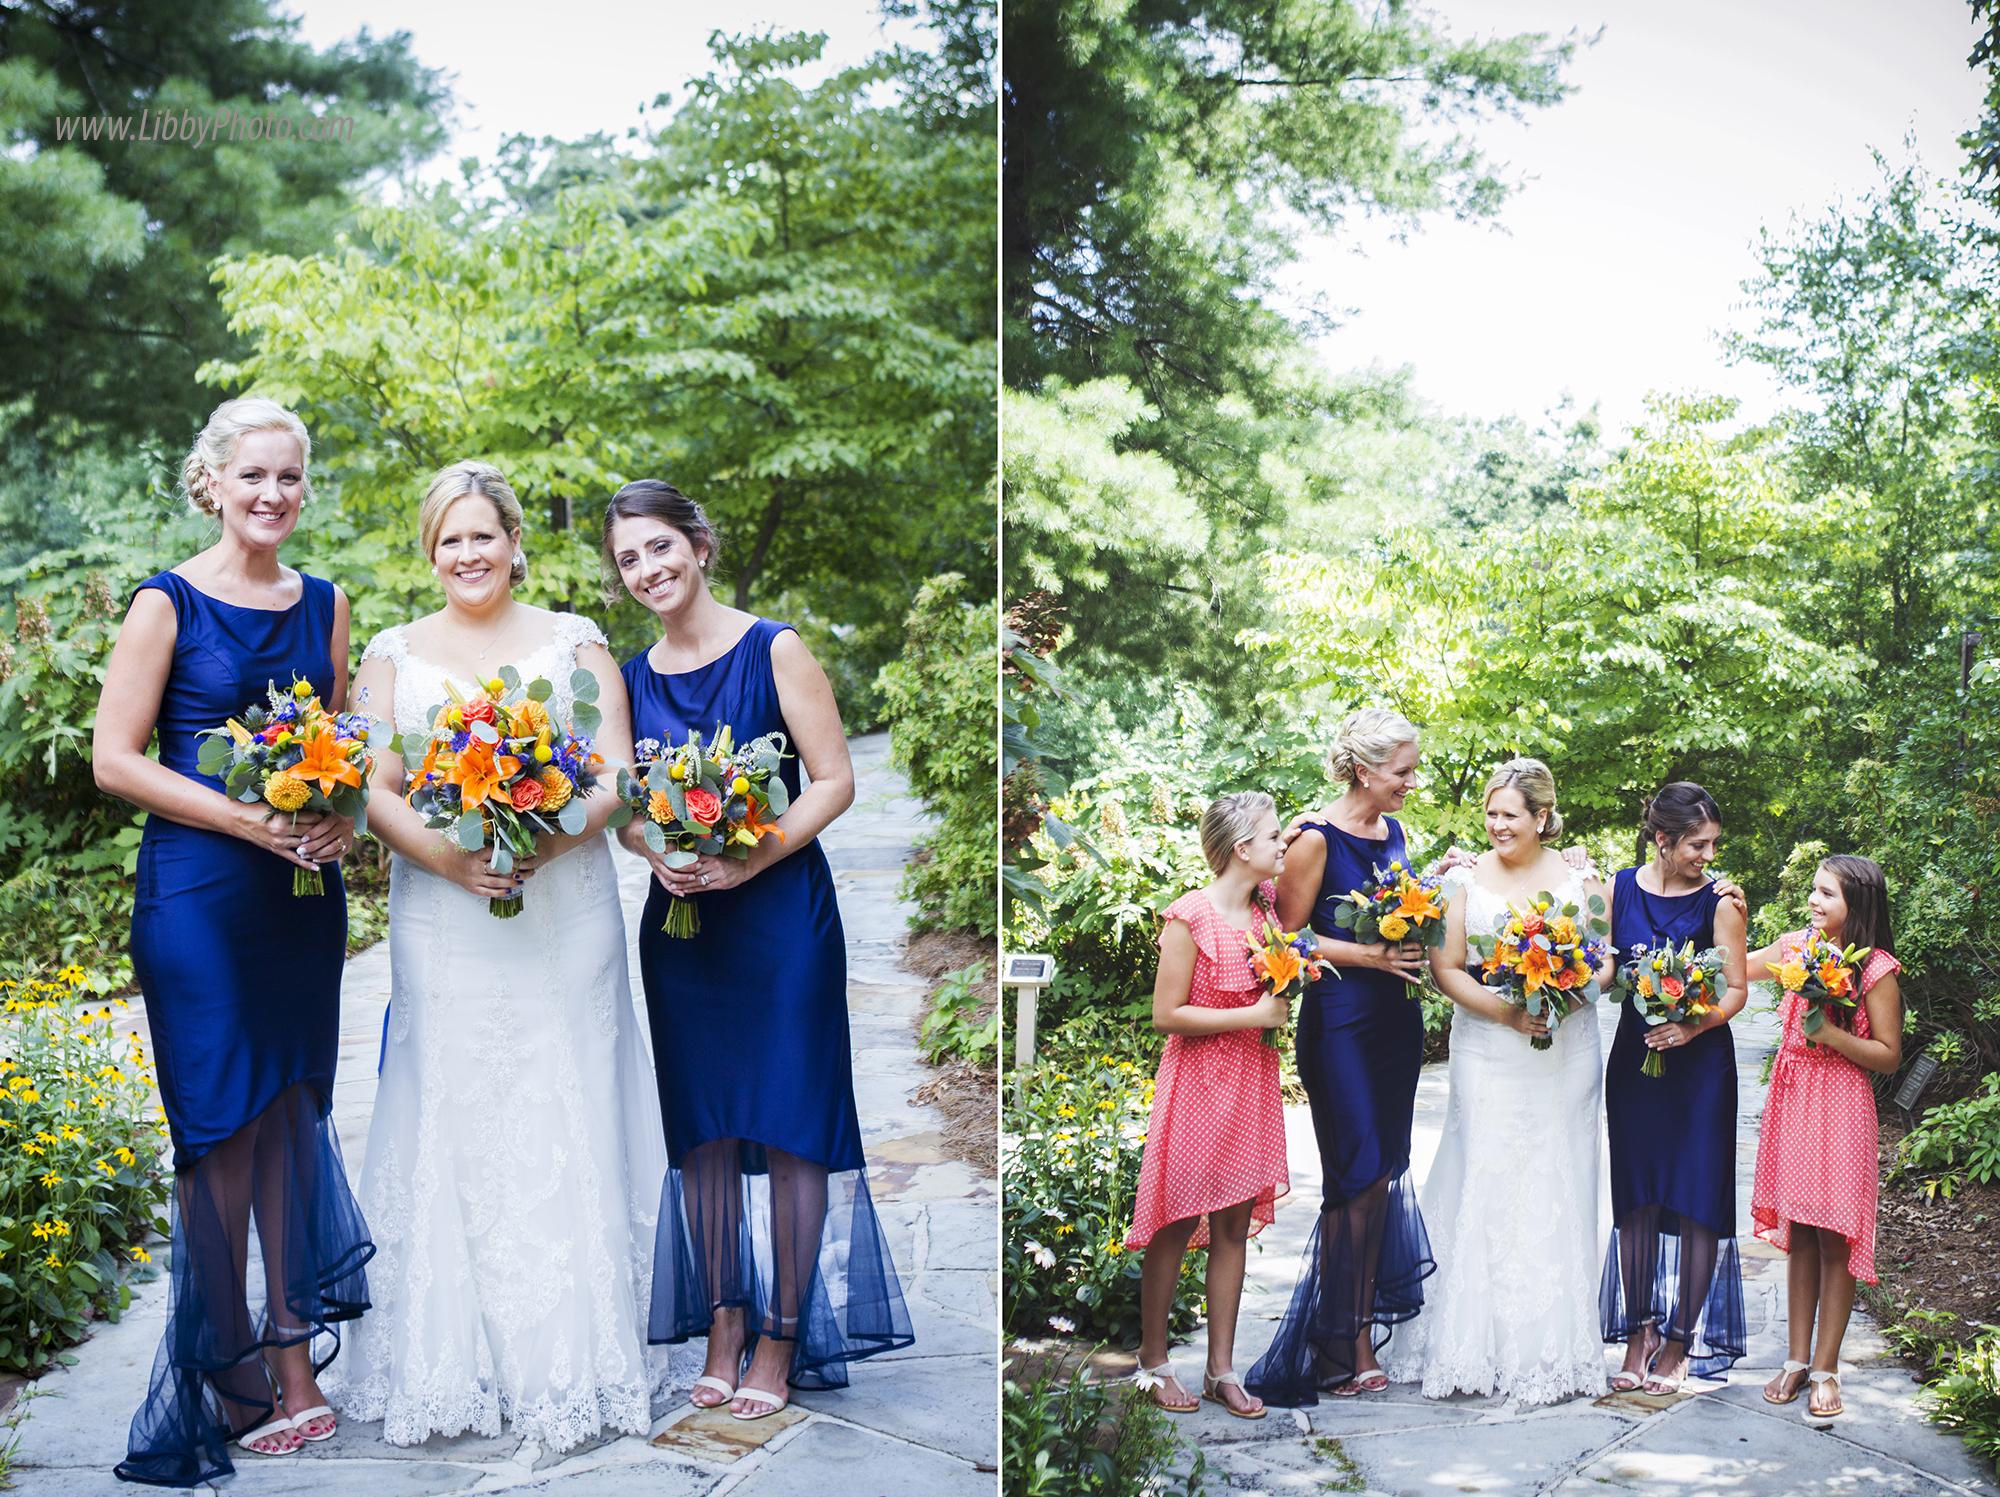 Atlanta wedding photography, Libbyphoto11 (34).jpg